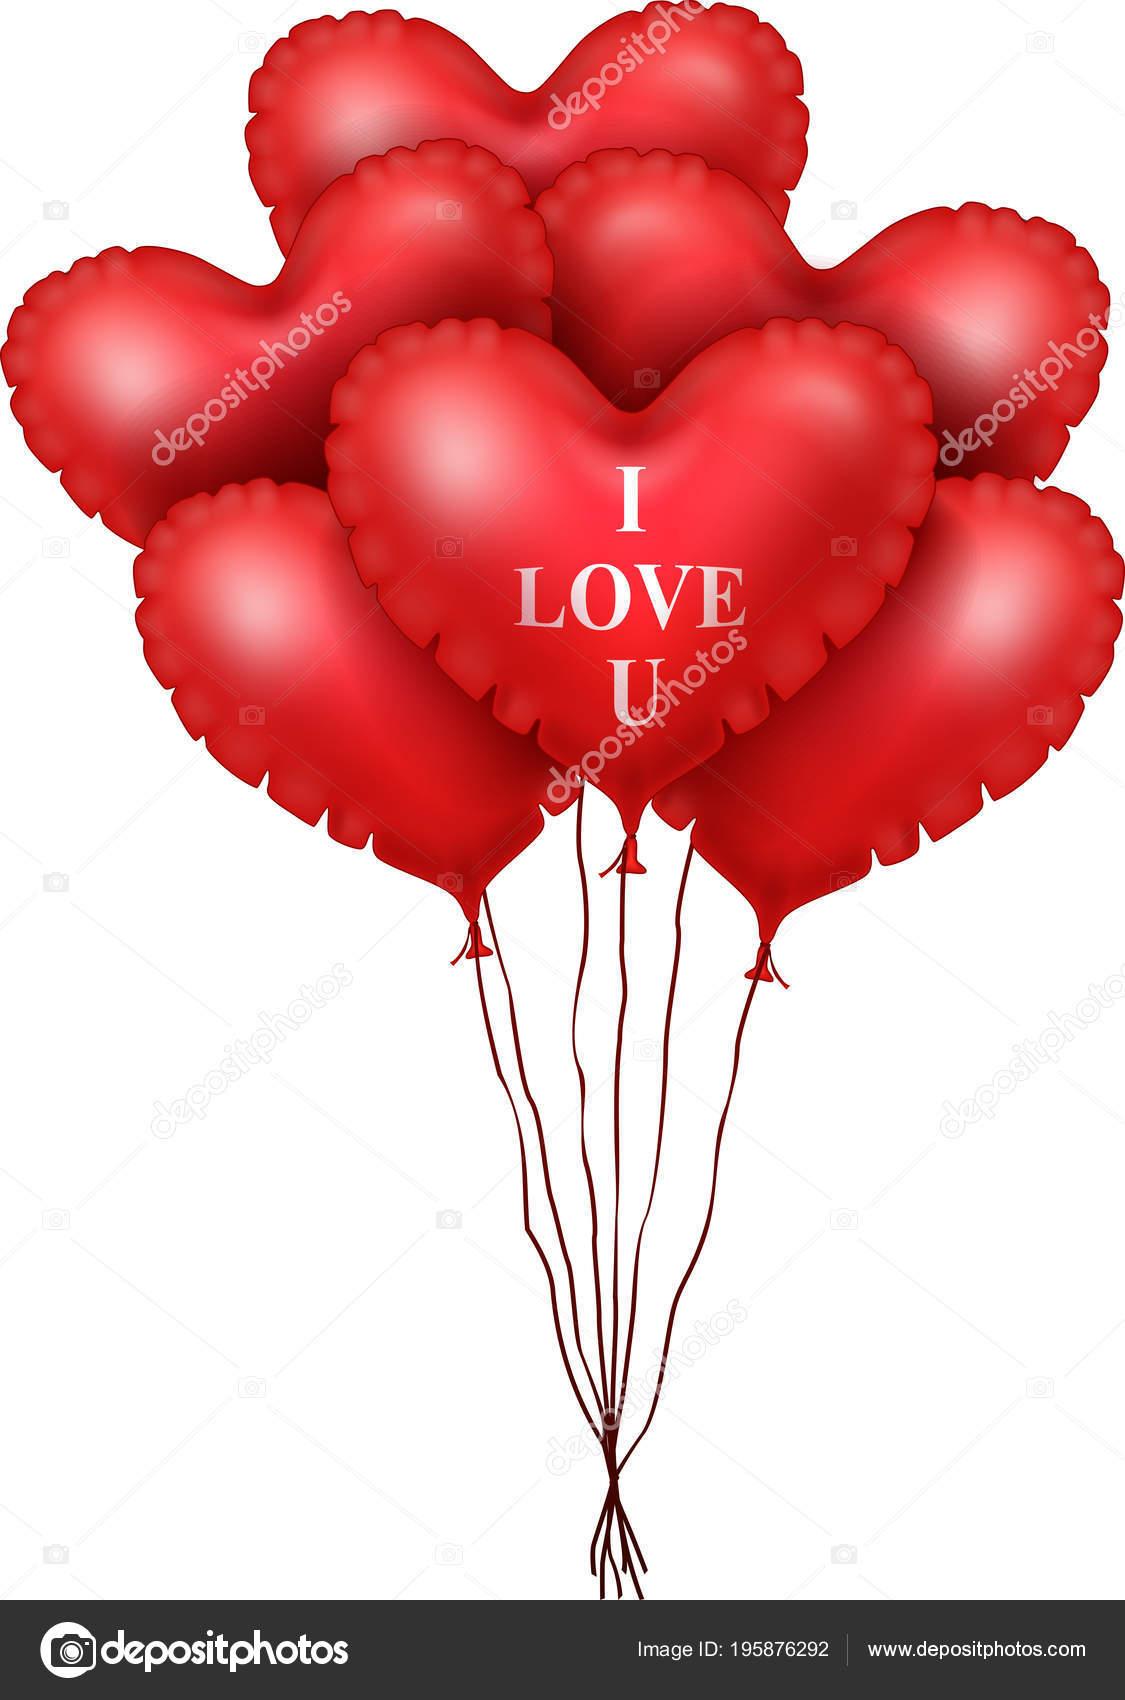 Rood Hart Ballonnen Geïsoleerd Witte Achtergrond Stockvector